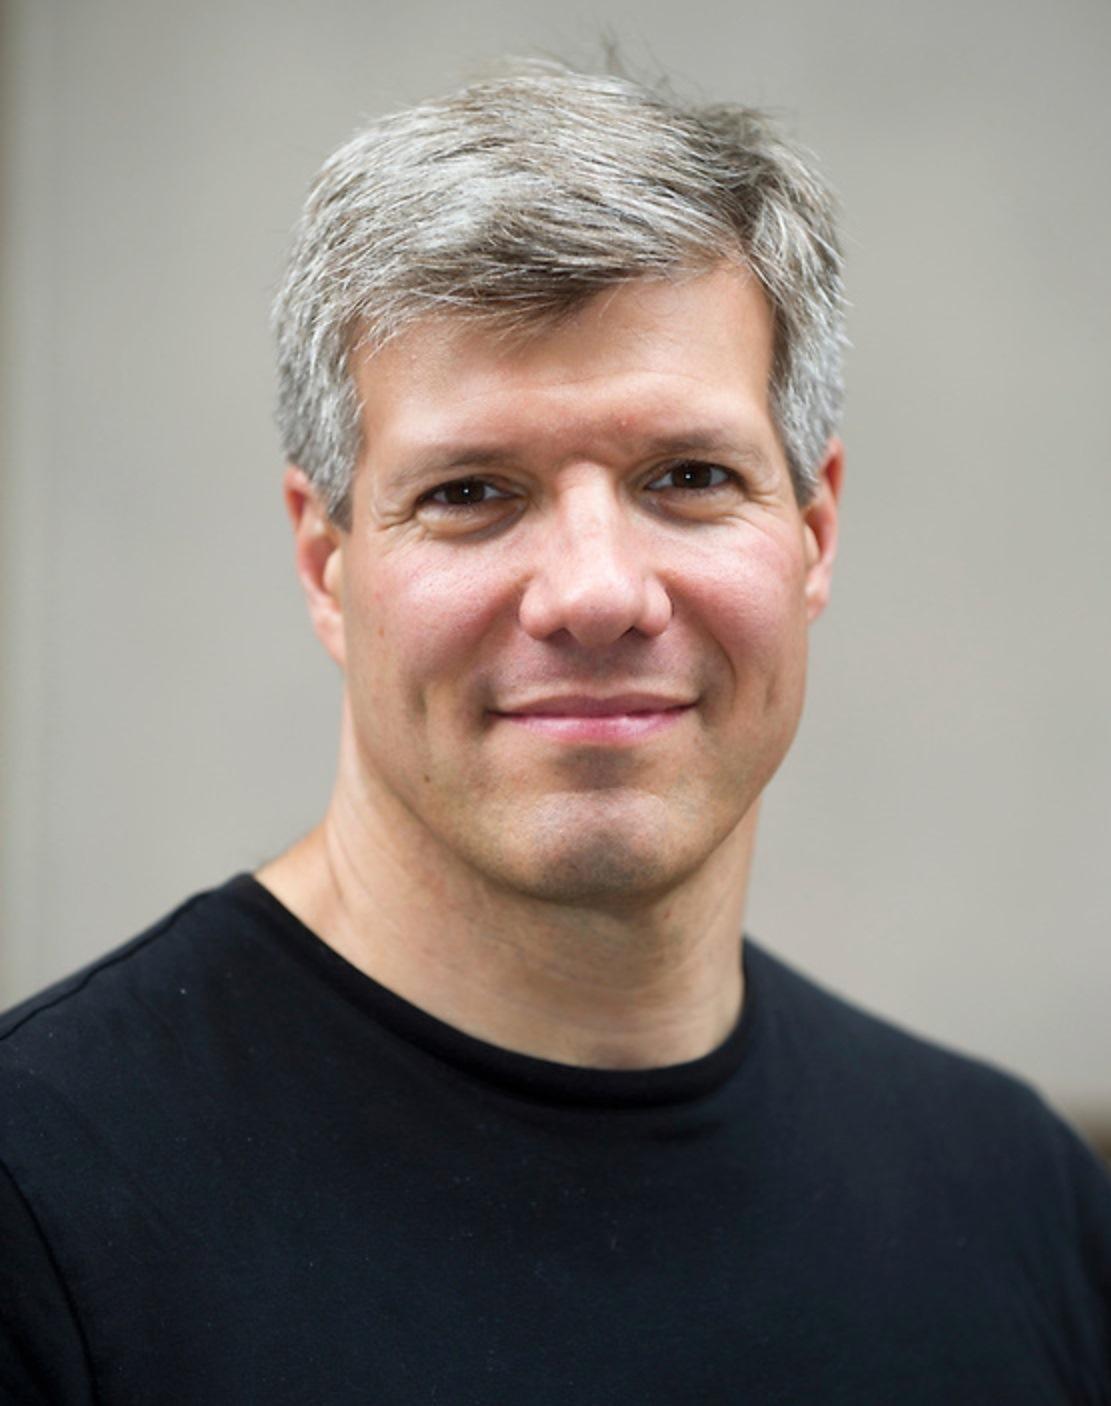 Edward Damiano, Professor of Biomedical Engineering at Boston University